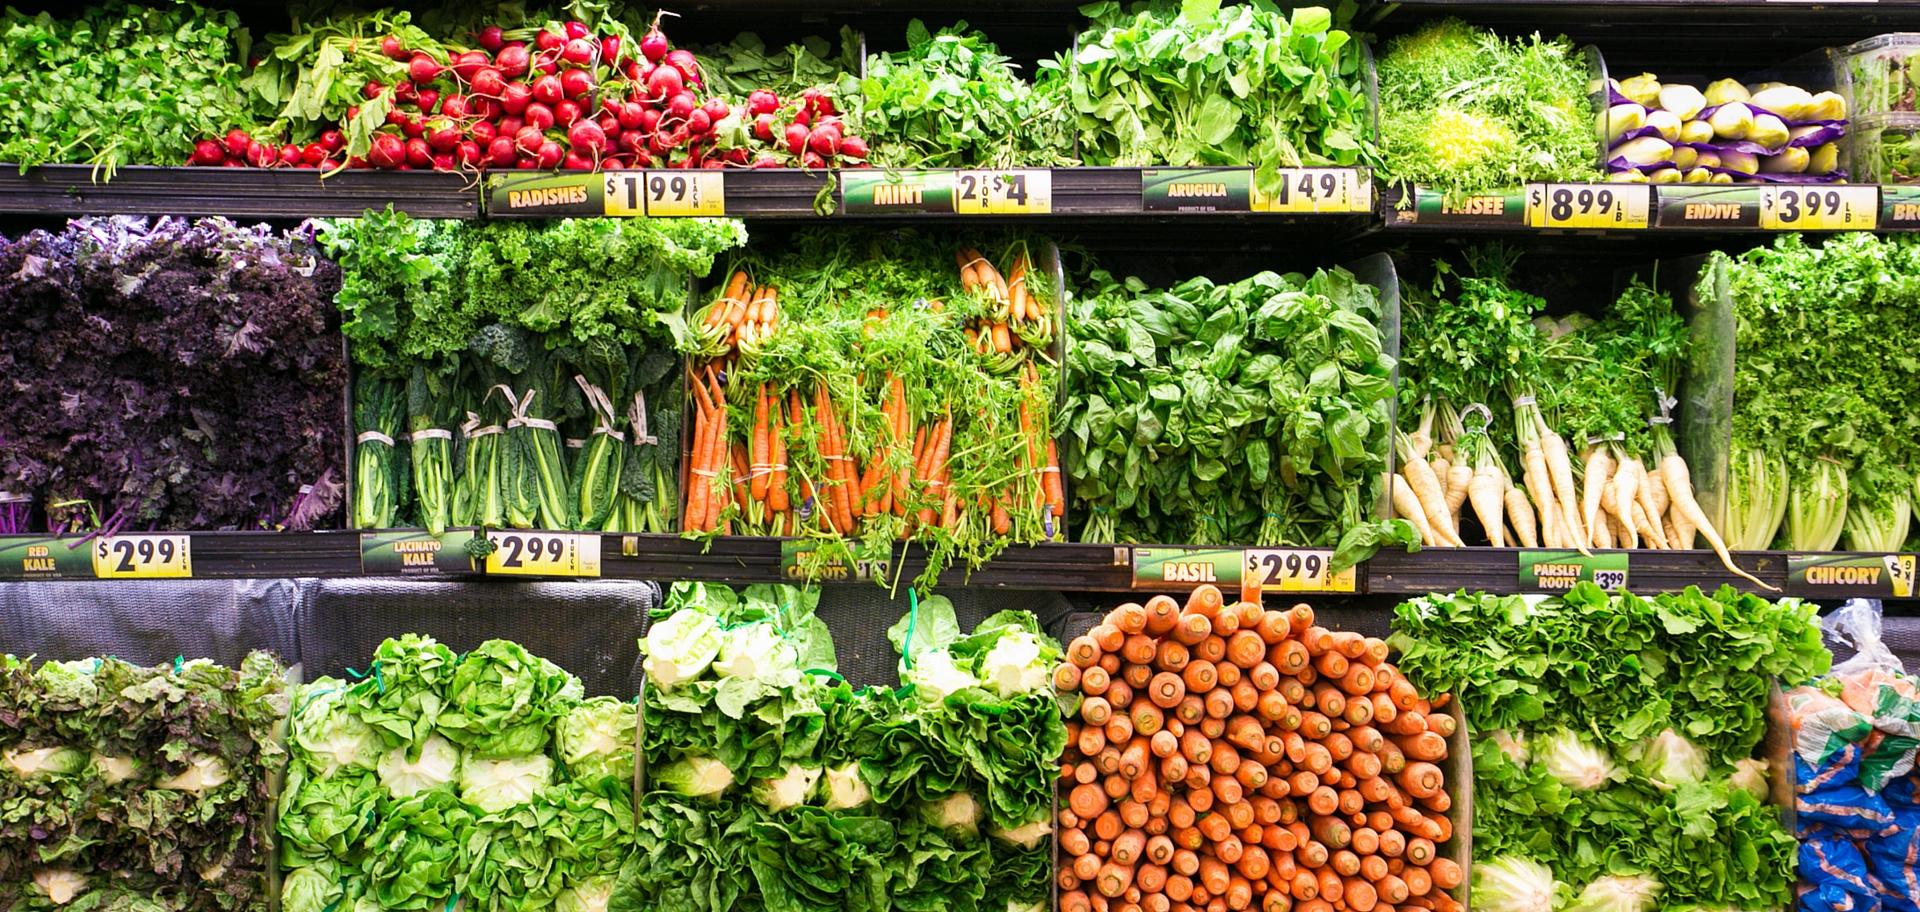 Cutting down on food waste